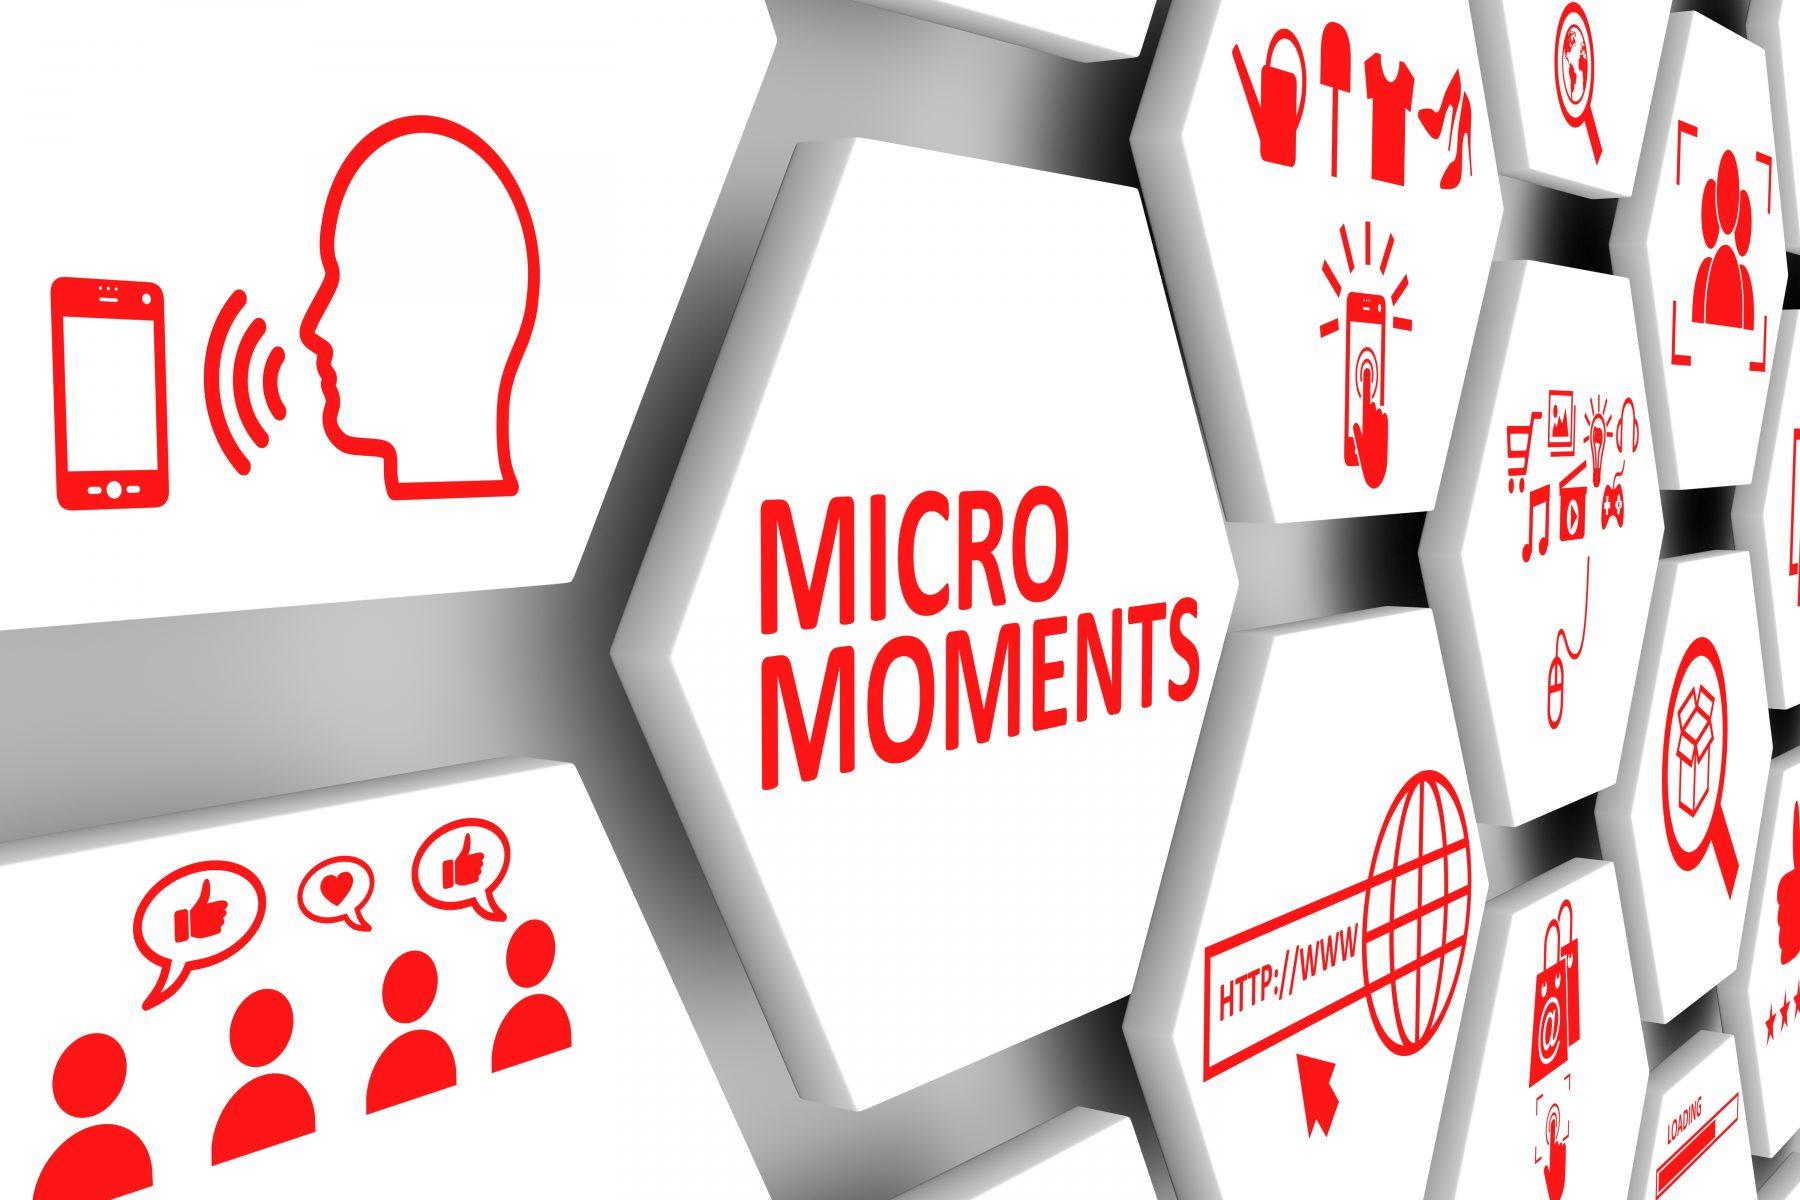 micro-moments-search